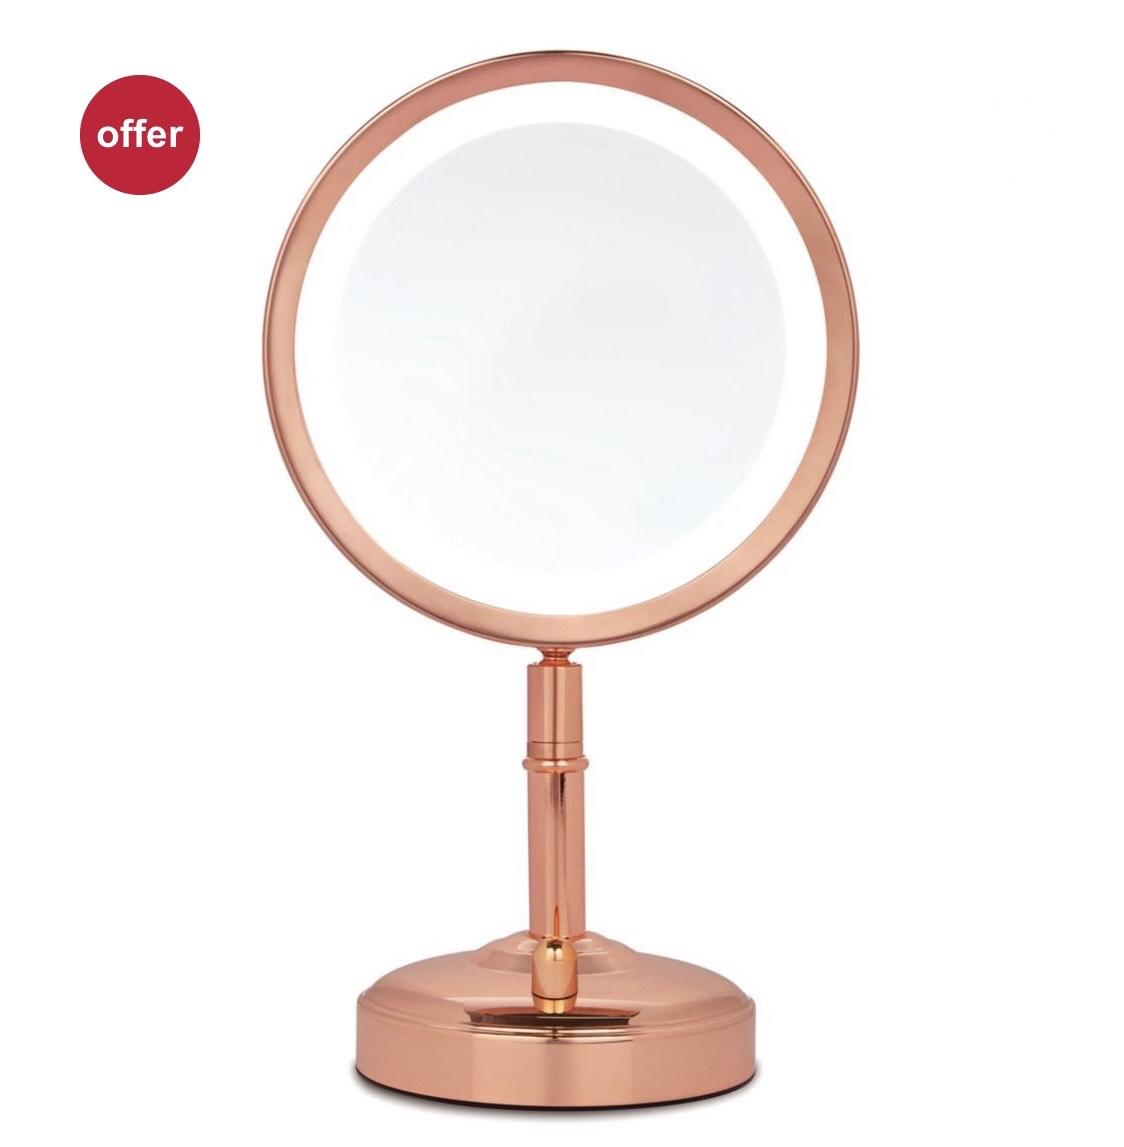 No7 Illuminated Makeup Mirror - Half Price £24.99 @ Boots